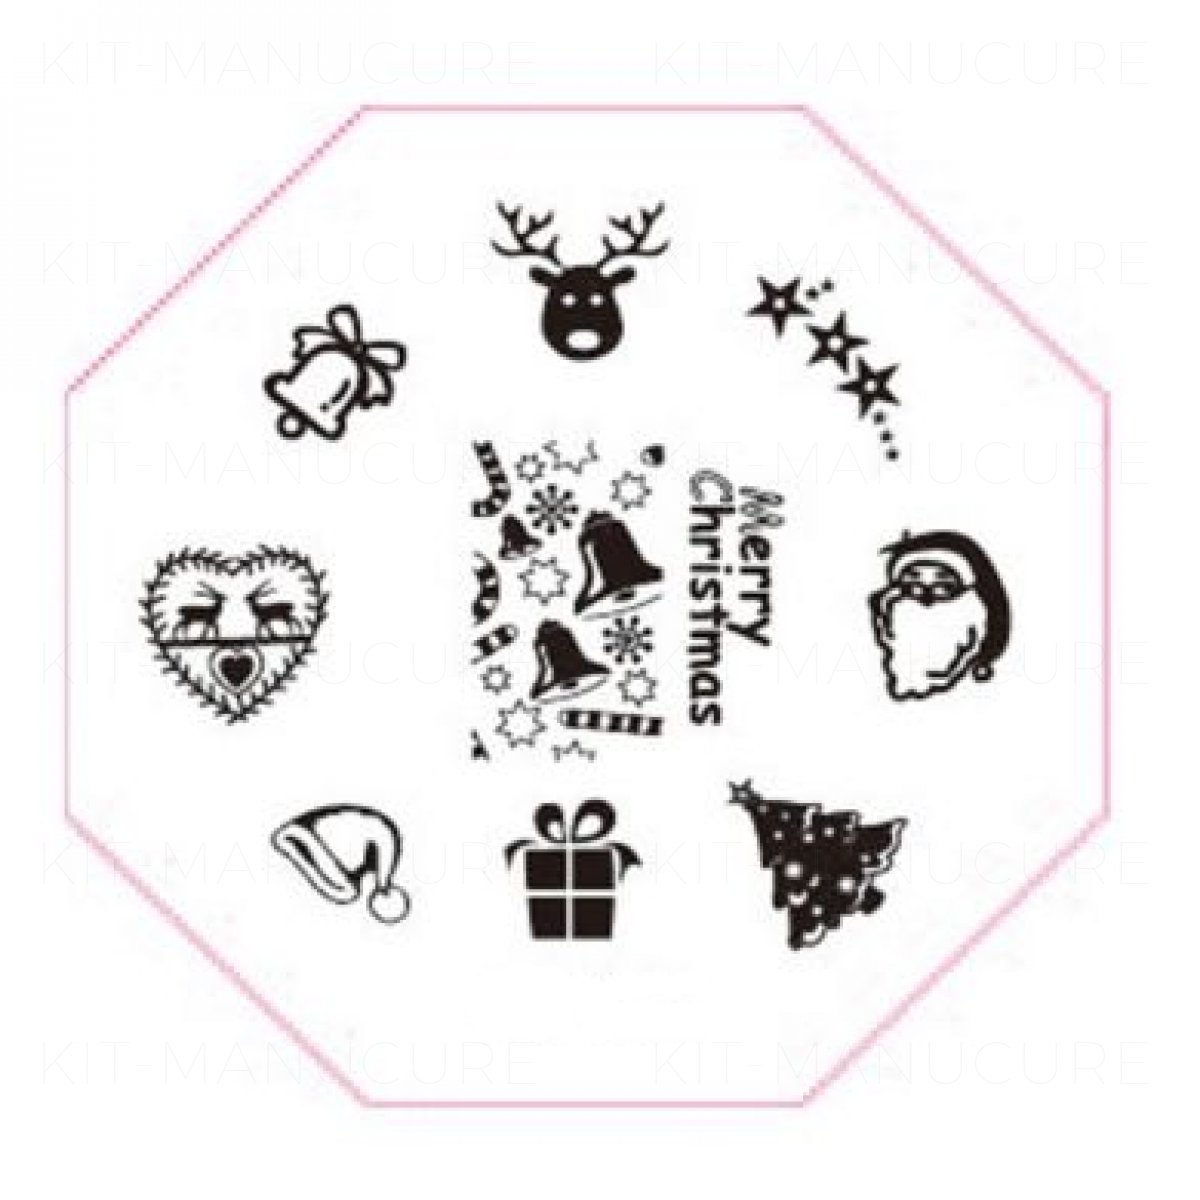 https://www.kit-manucure.com/1078-thickbox_default/plaque-de-stamping-de-noël-sapin-renne-cadeau-et-merry-christmas.jpg